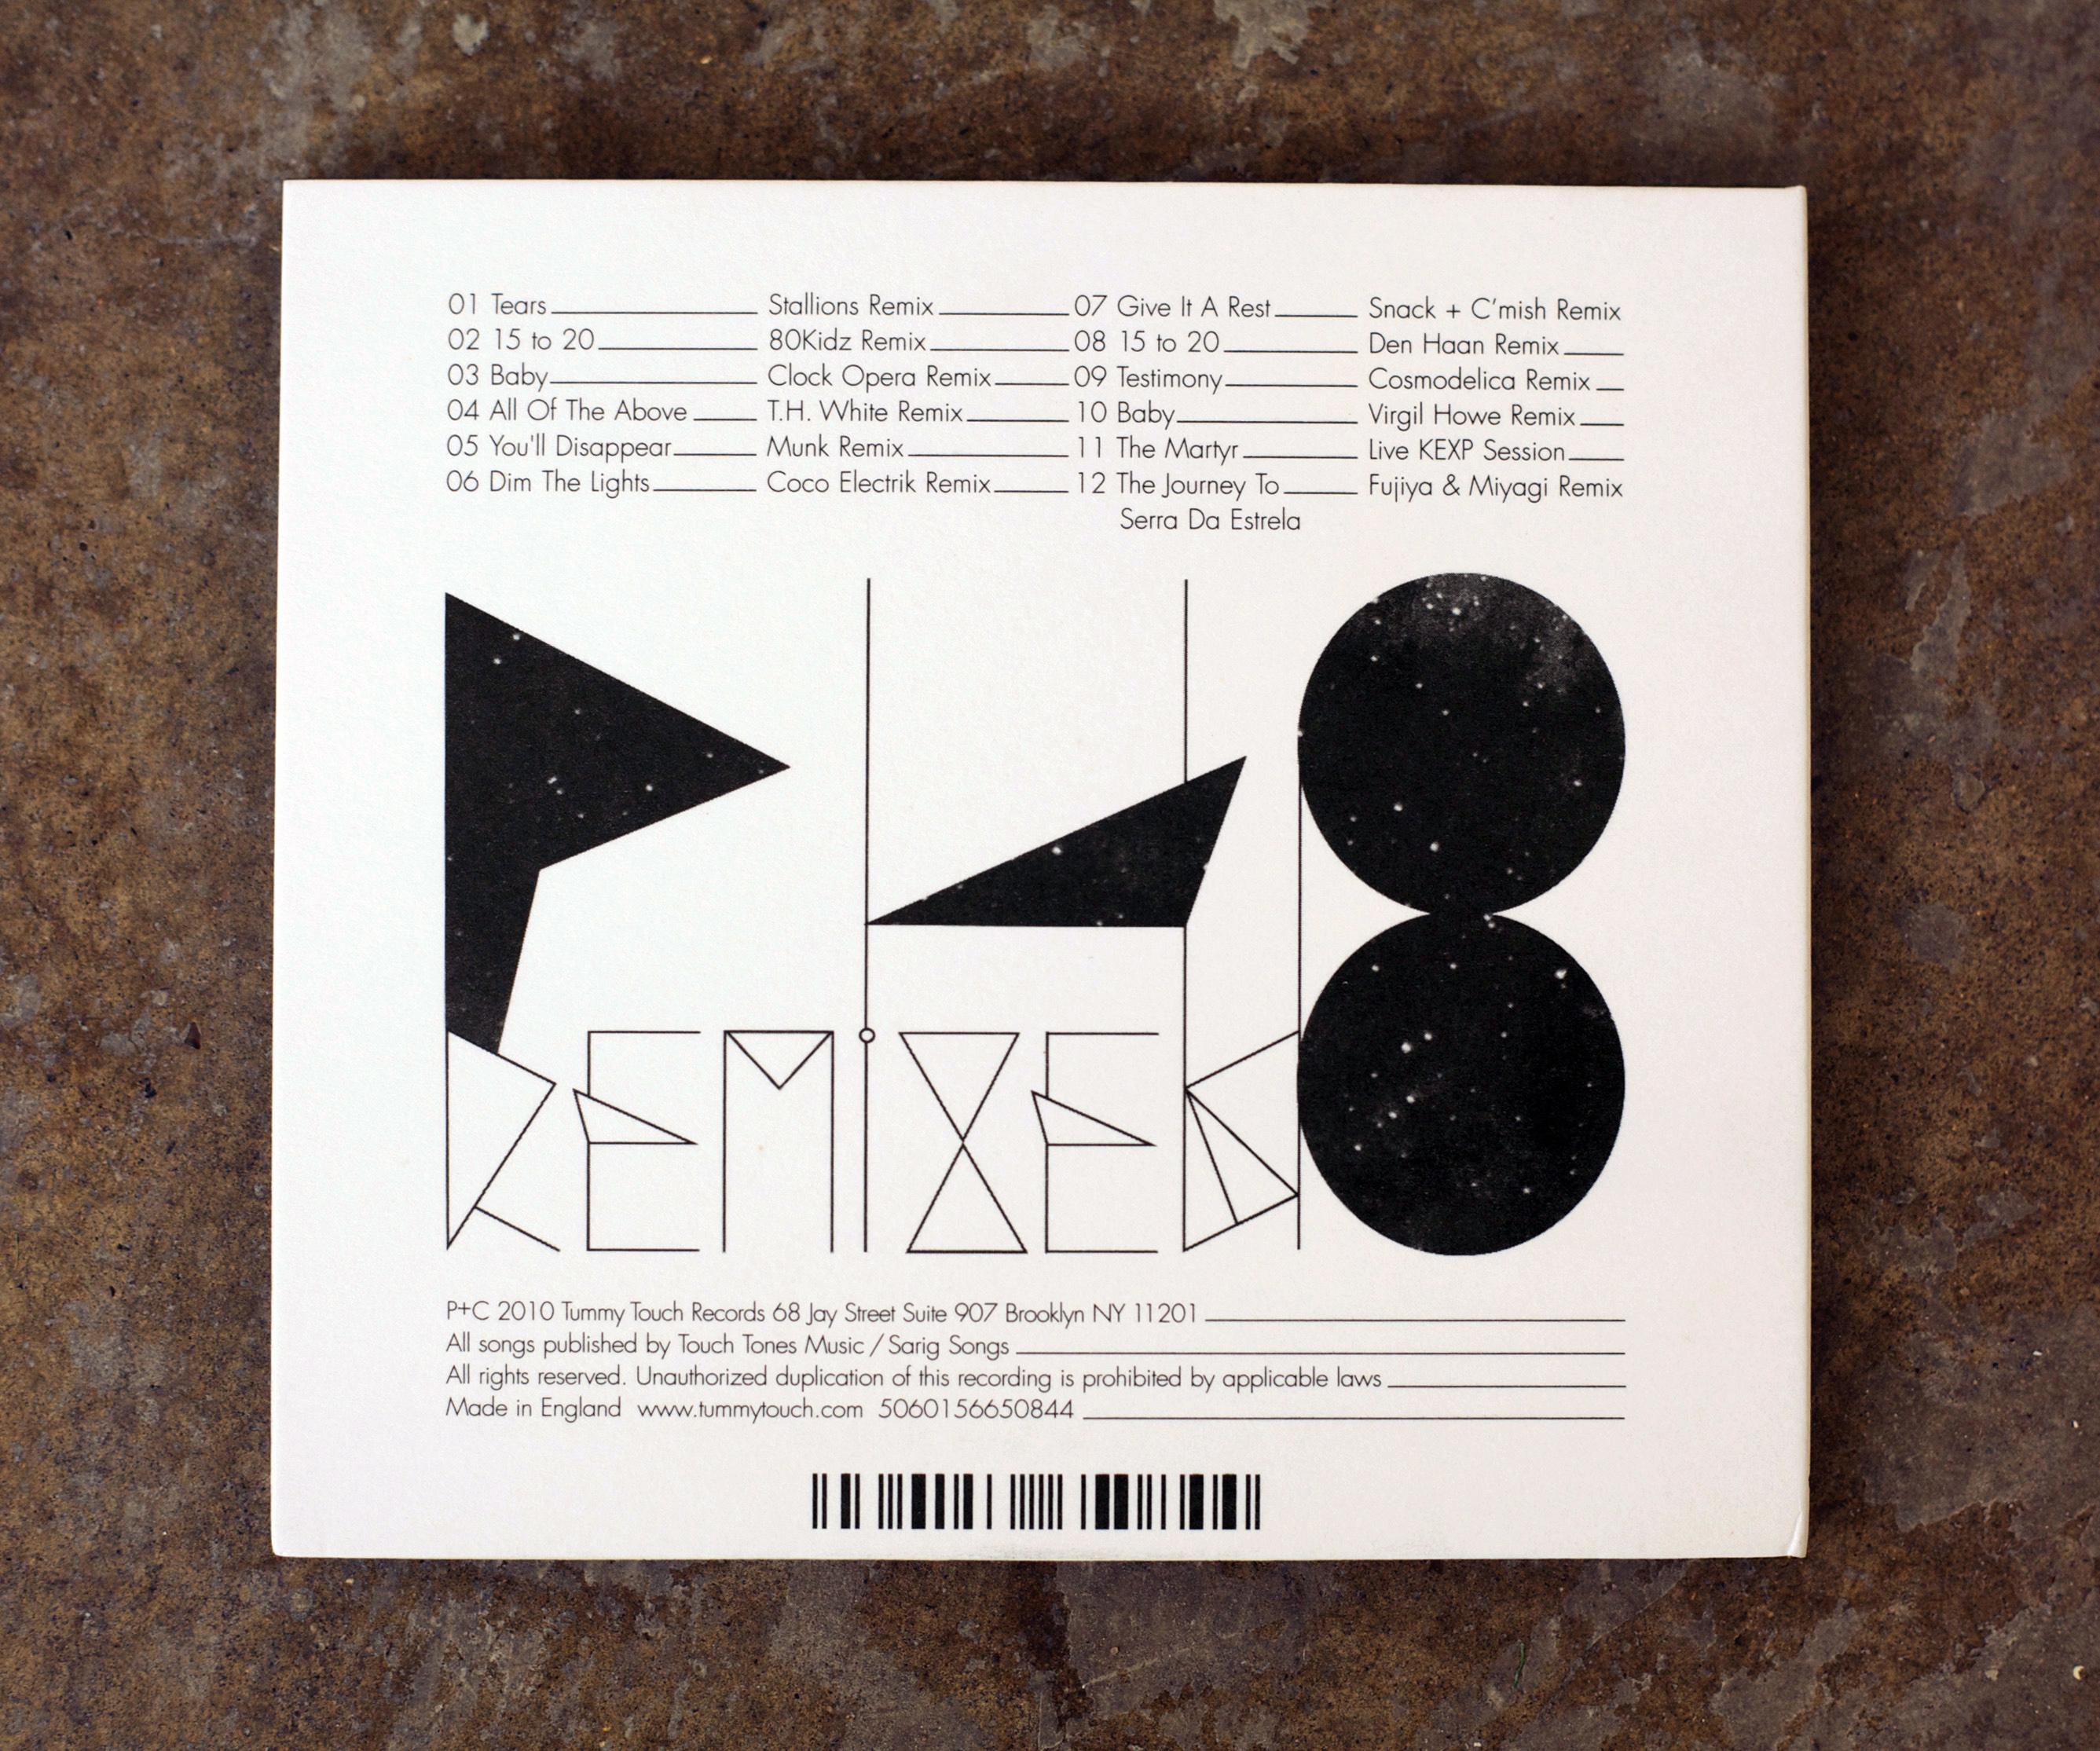 Paul Flack - The Phenomenal Handclap Band